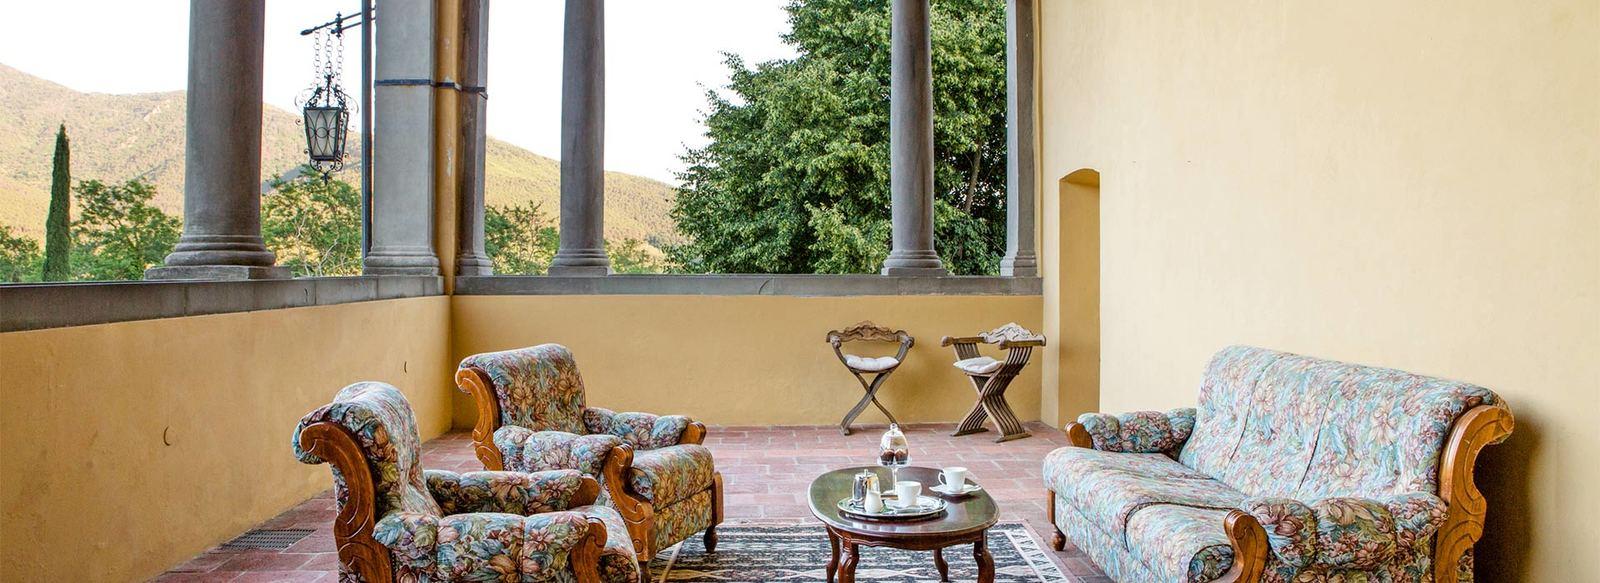 Villa rinascimentale immersa nella natura toscana